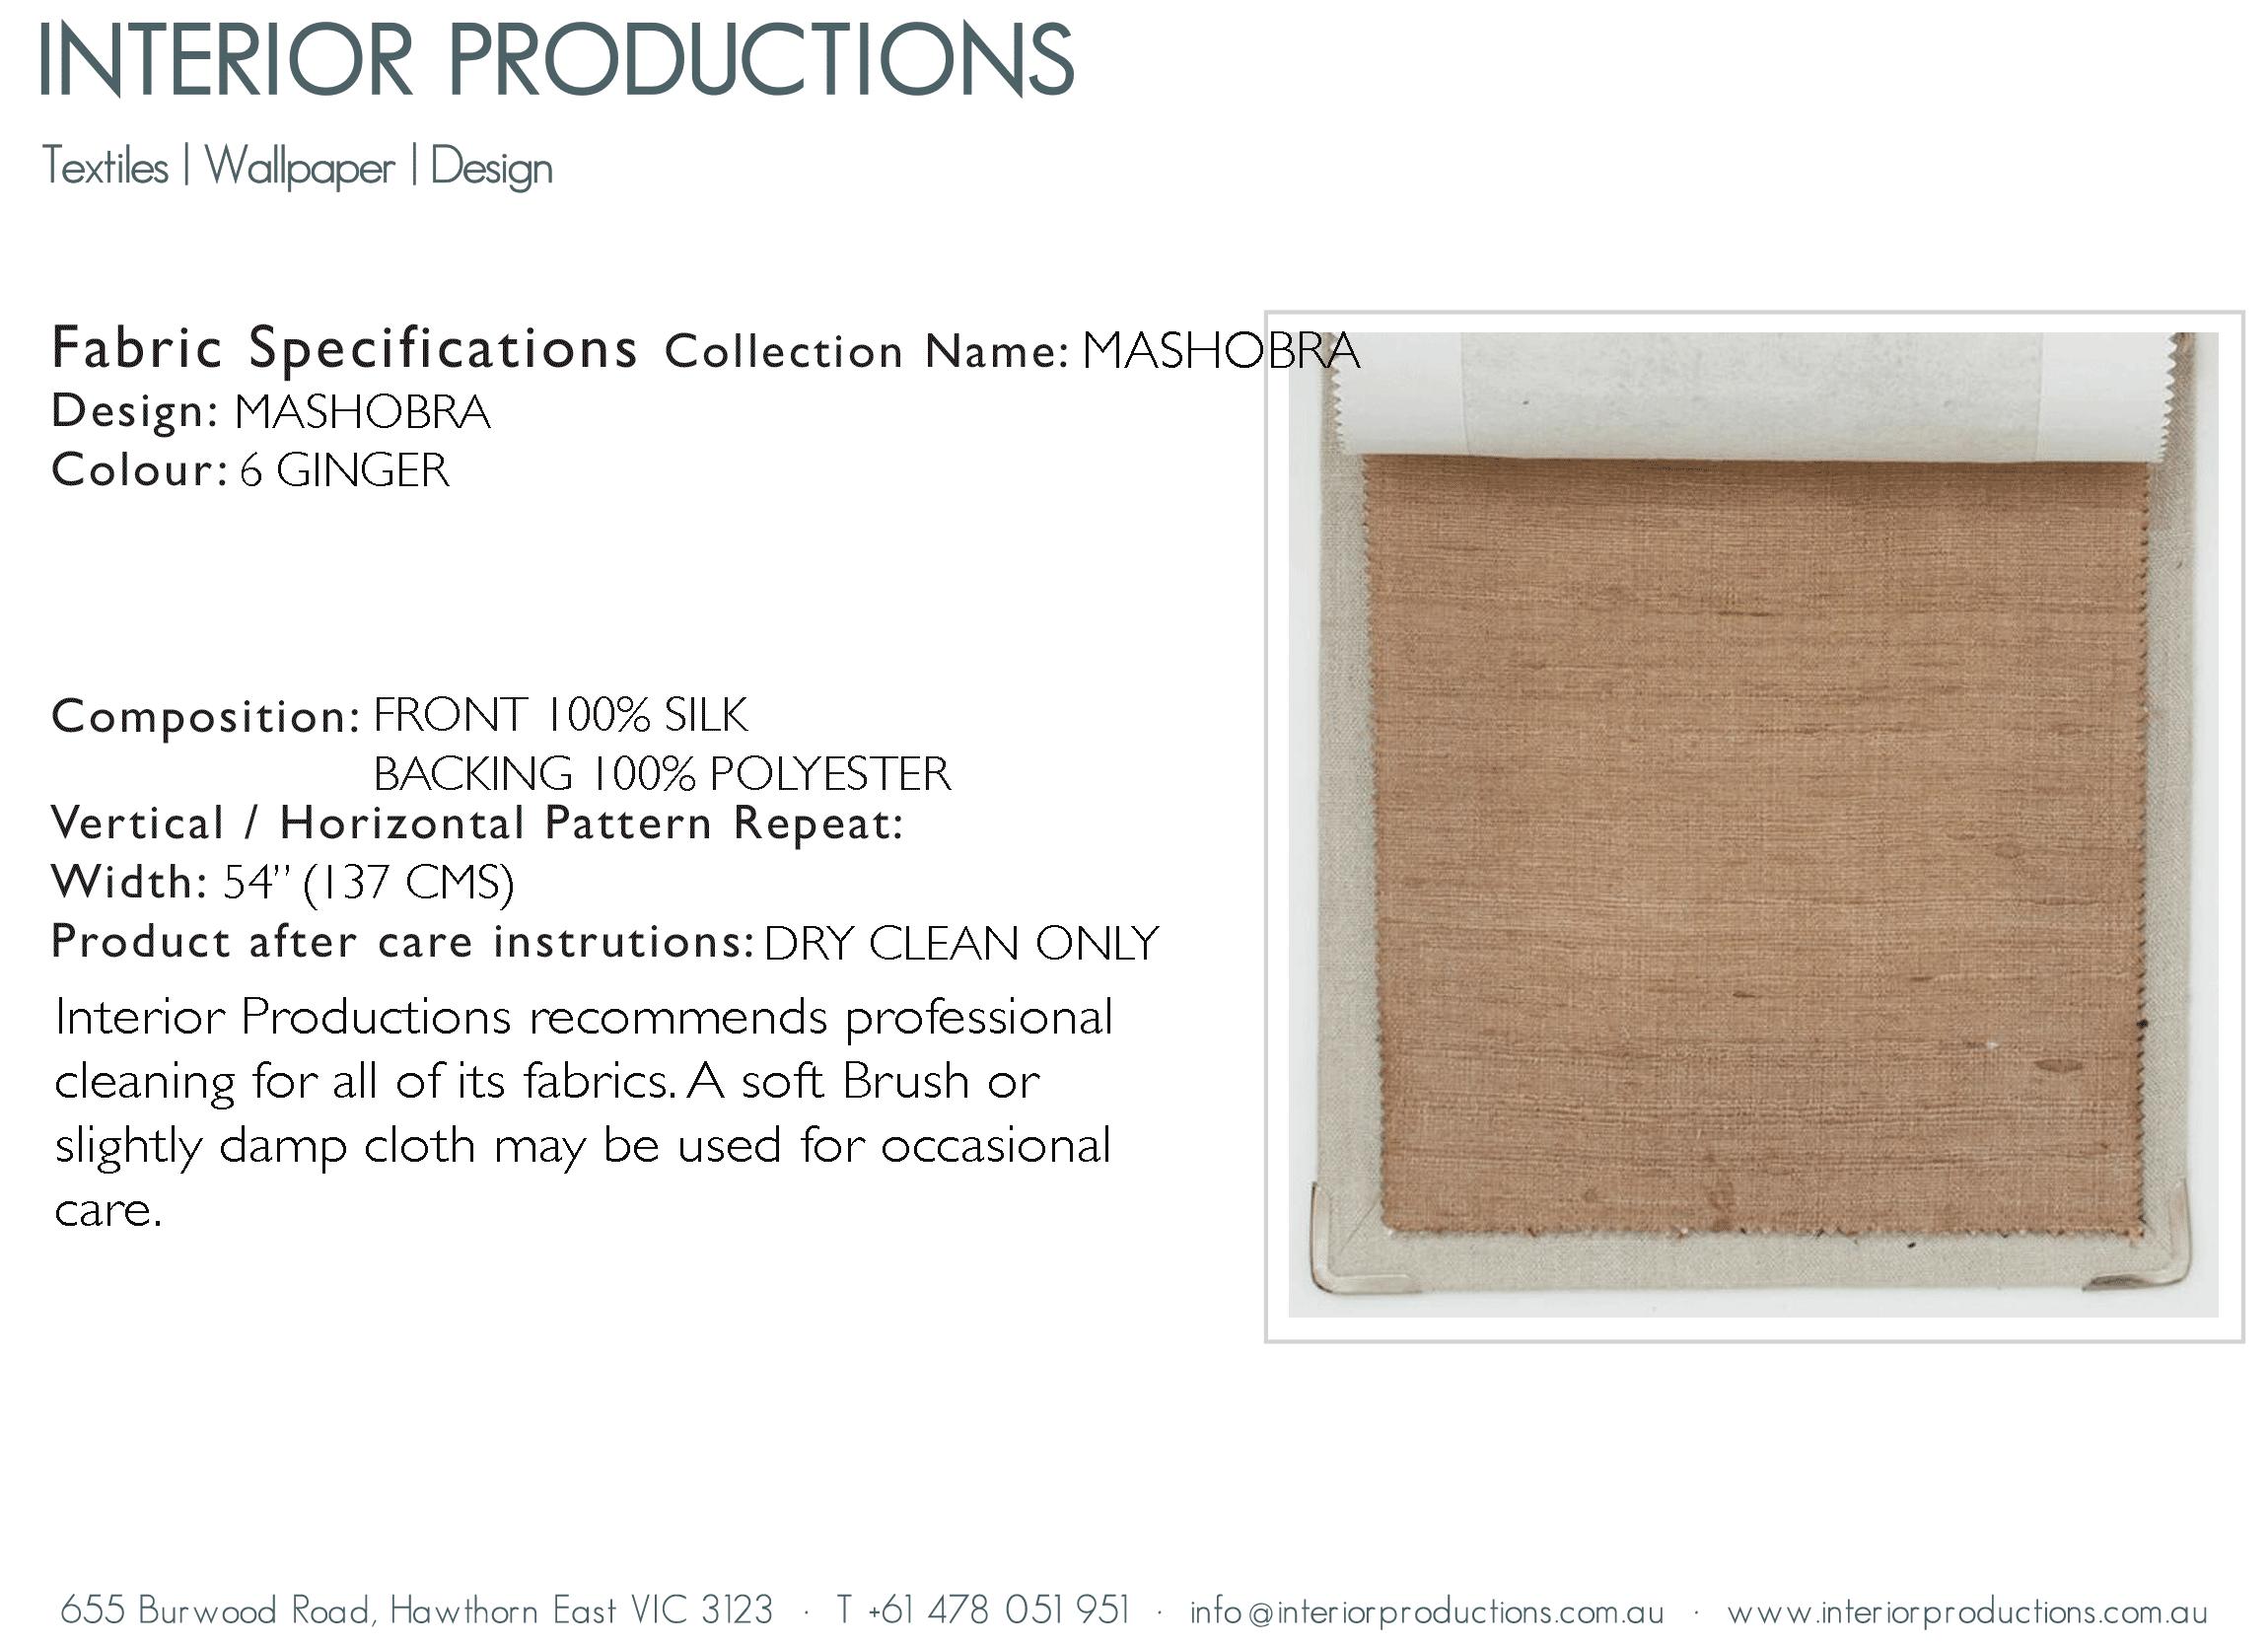 interior_productions_MASHOBRA---6-GINGER